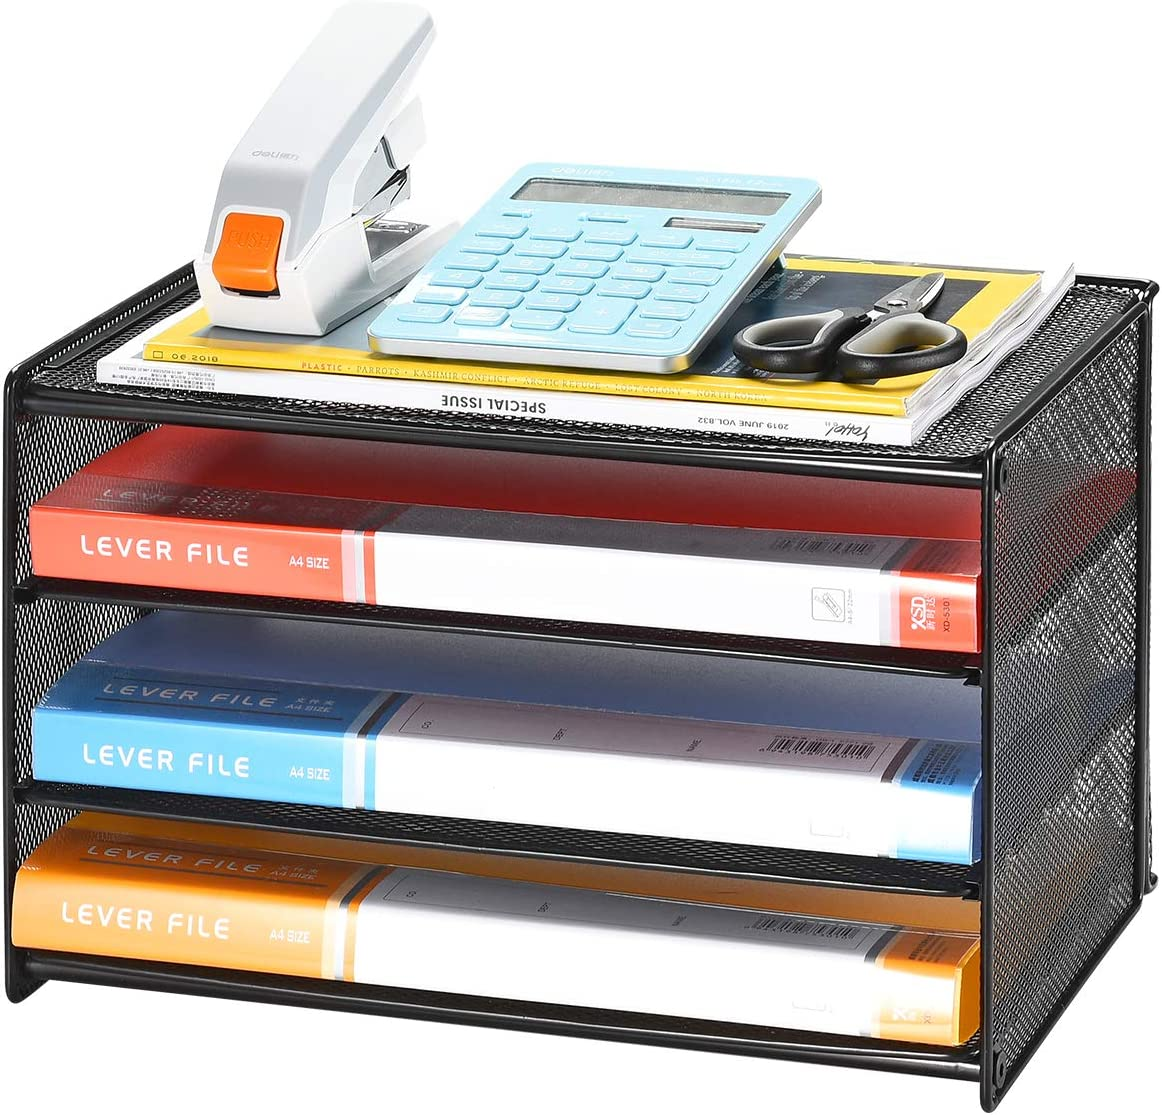 Samstar Charlotte Mall Paper Letter Tray safety 3 Sort File Desk Tier Organizer